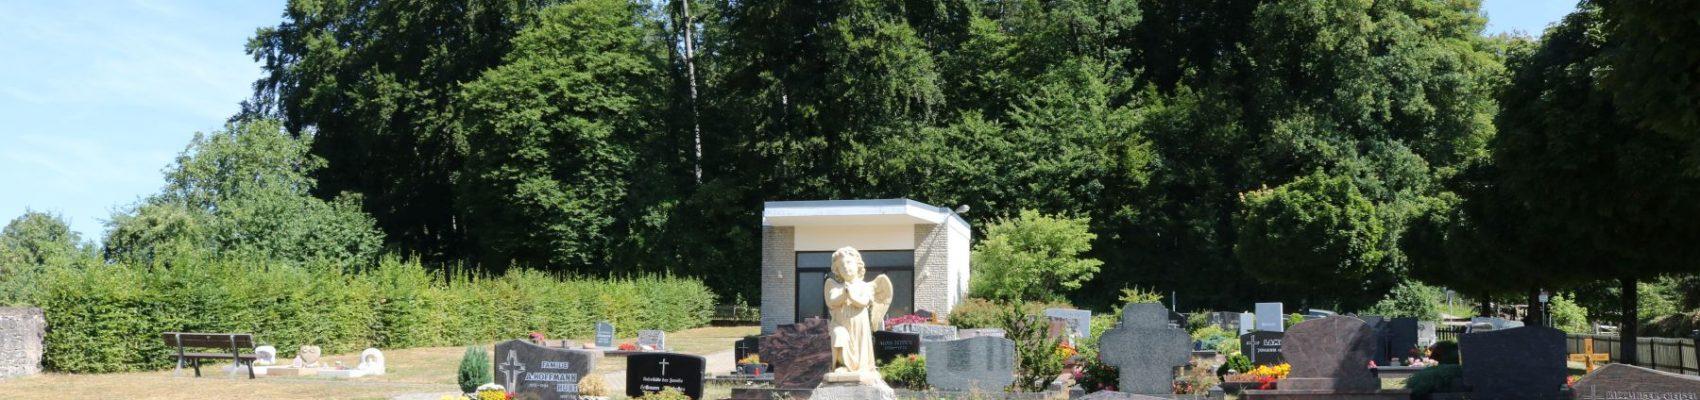 Friedhof Silwingen